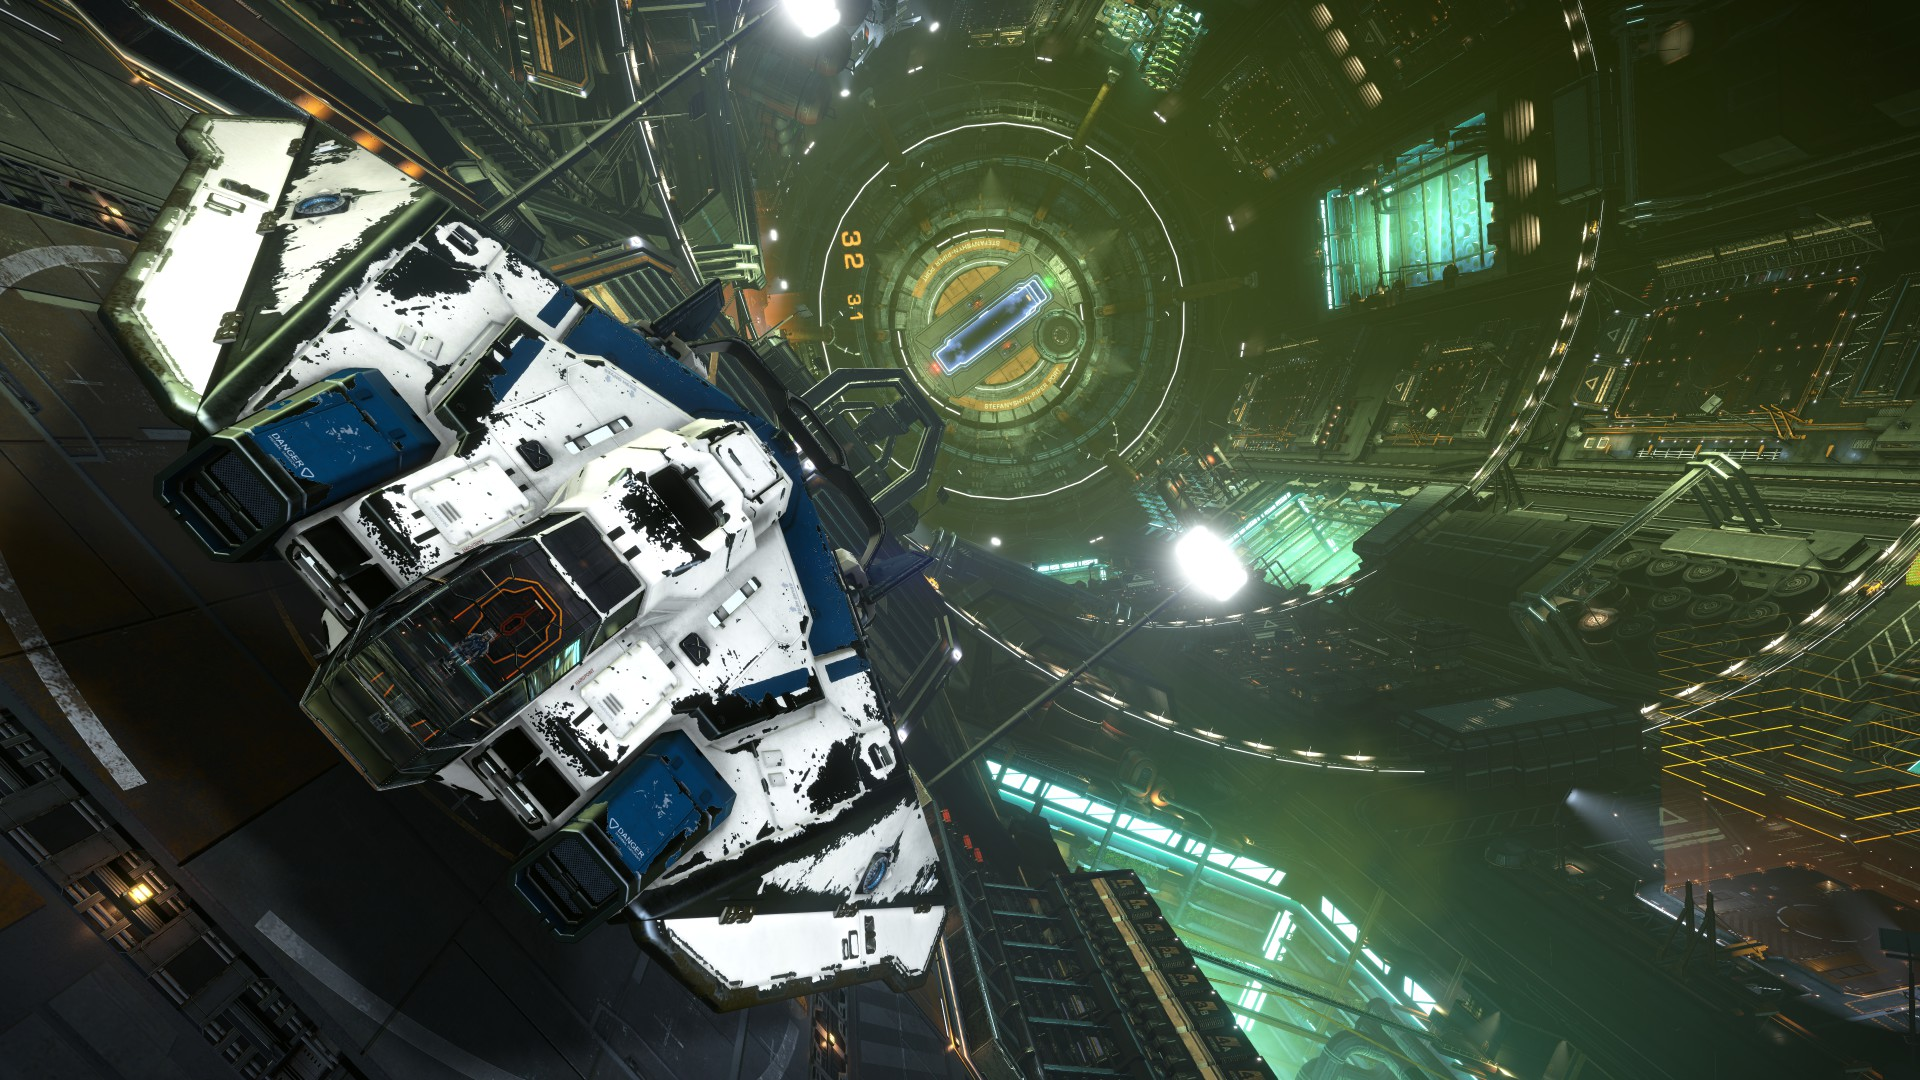 General 1920x1080 Elite: Dangerous space Space Simulator spaceship space station Starport Coriolis Station ASP Explorer